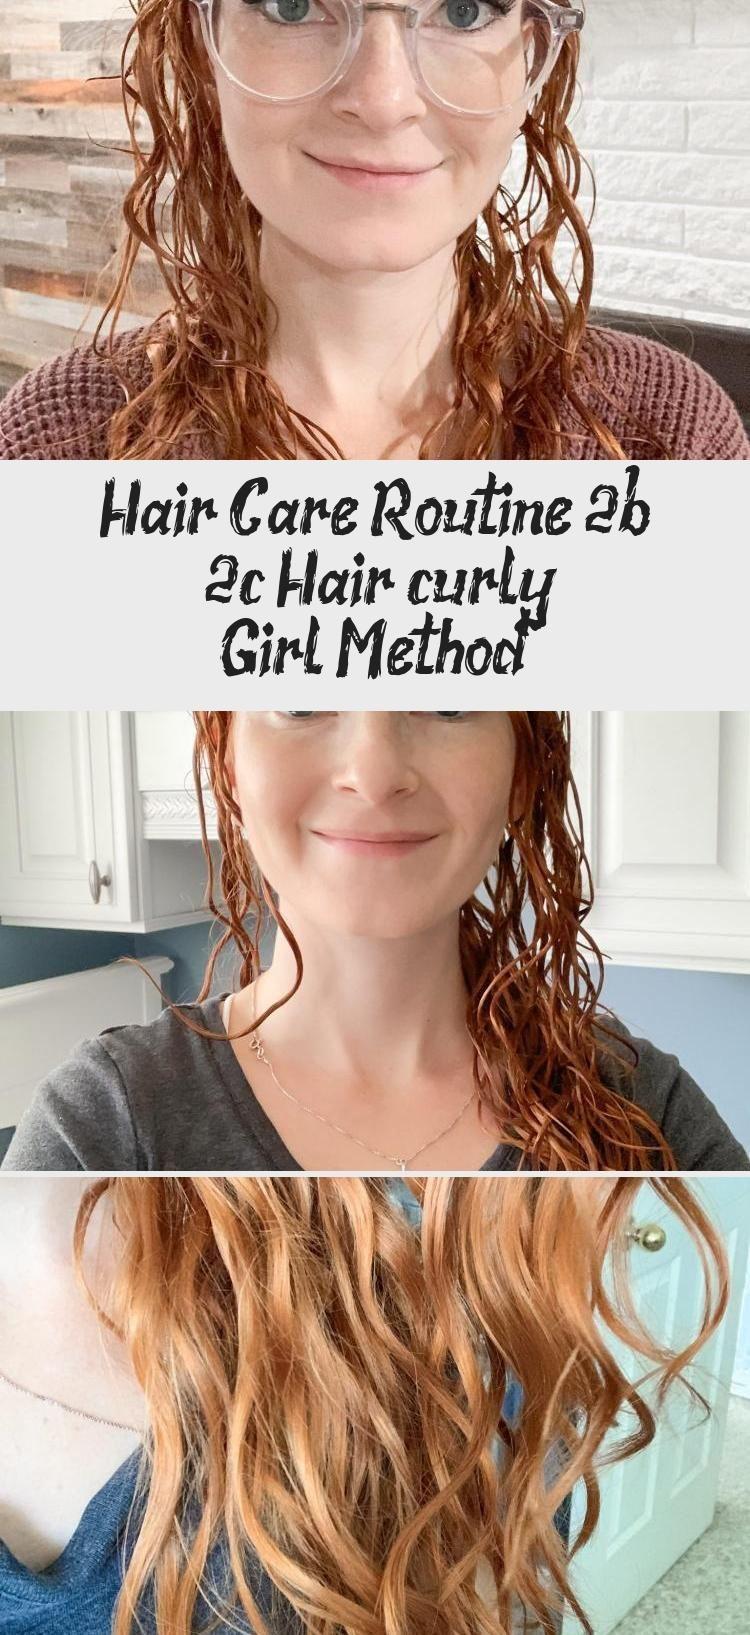 Curly Hair Routine! Curly hair routine, Hair diffuser